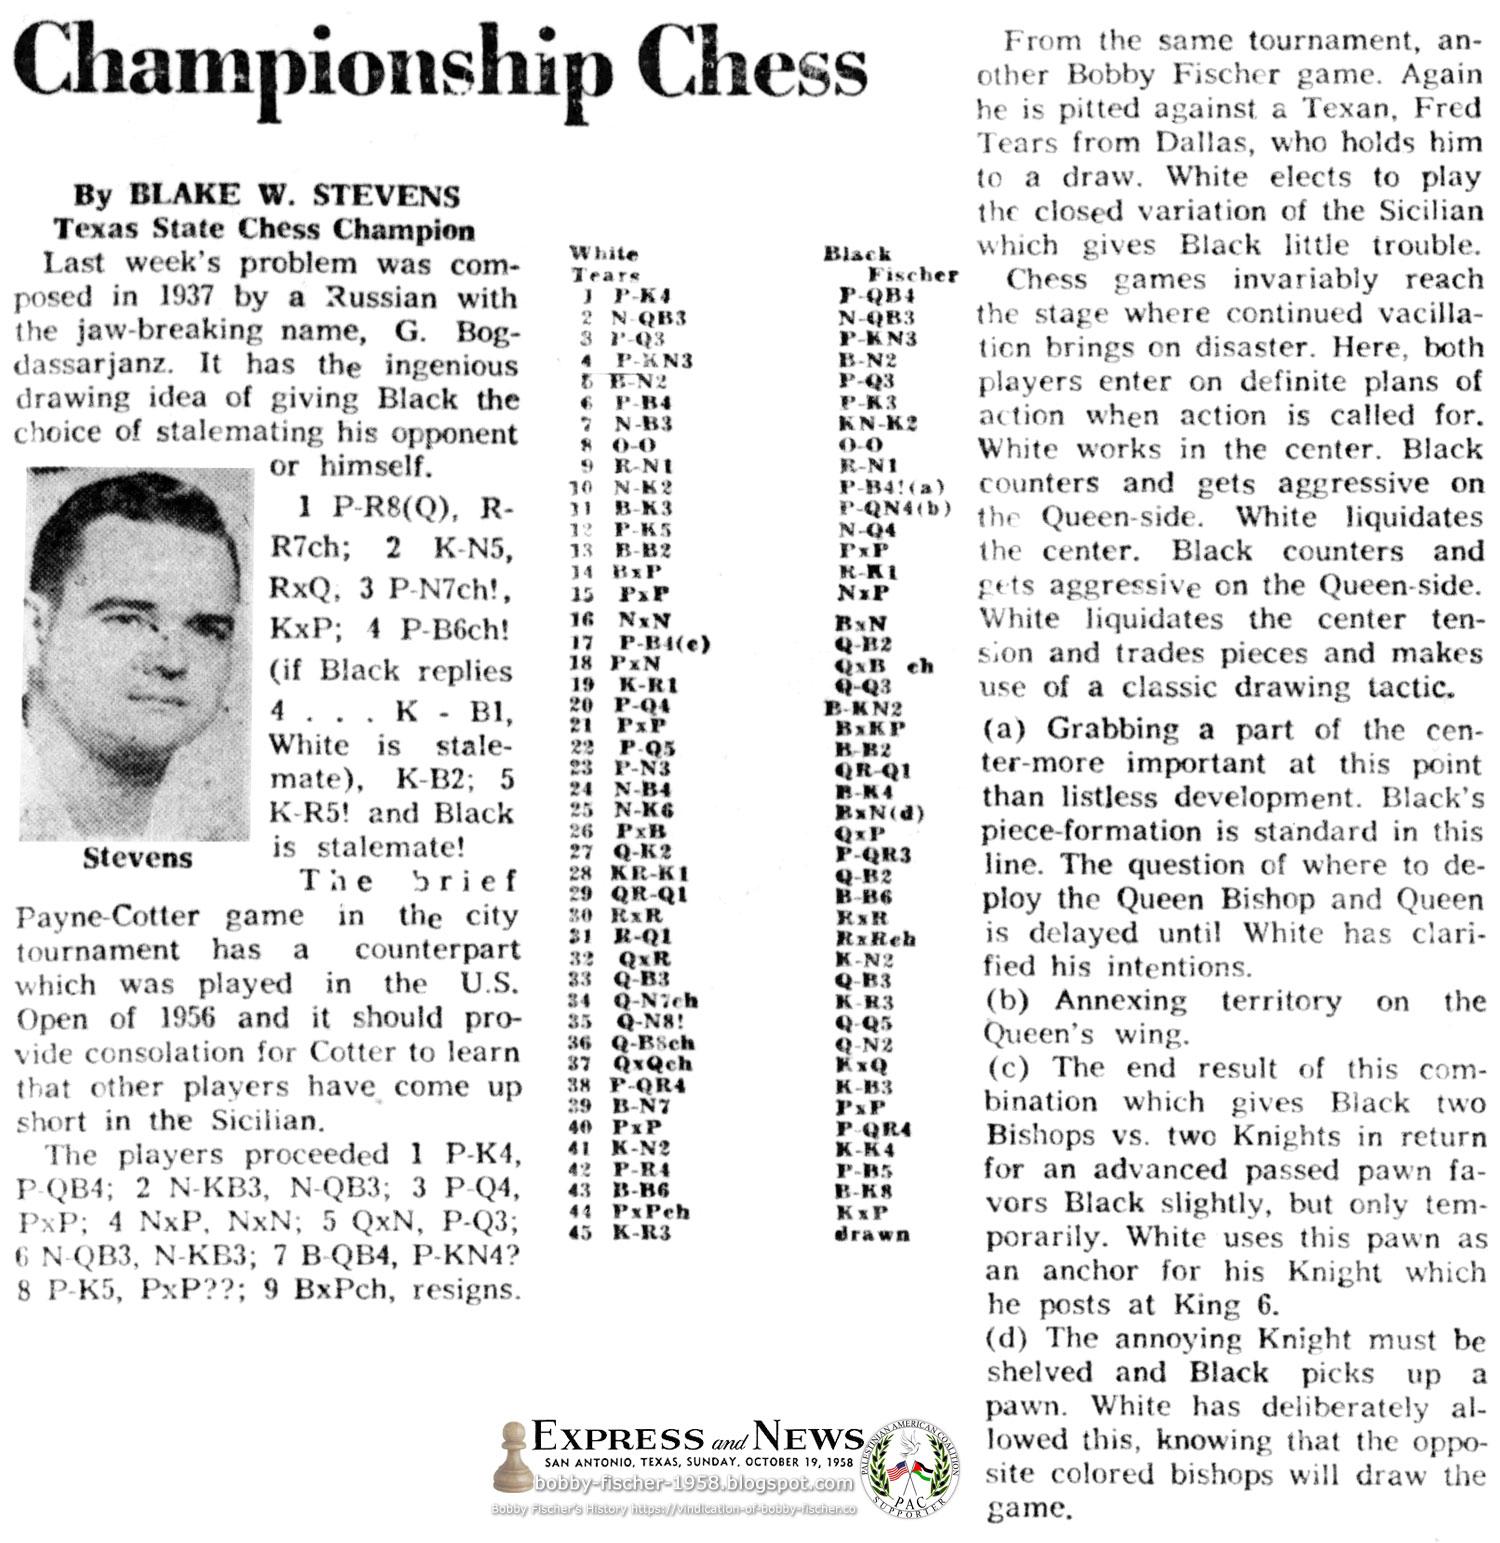 Championship Chess: Fischer Versus Dallas, Texas' Fred Tears